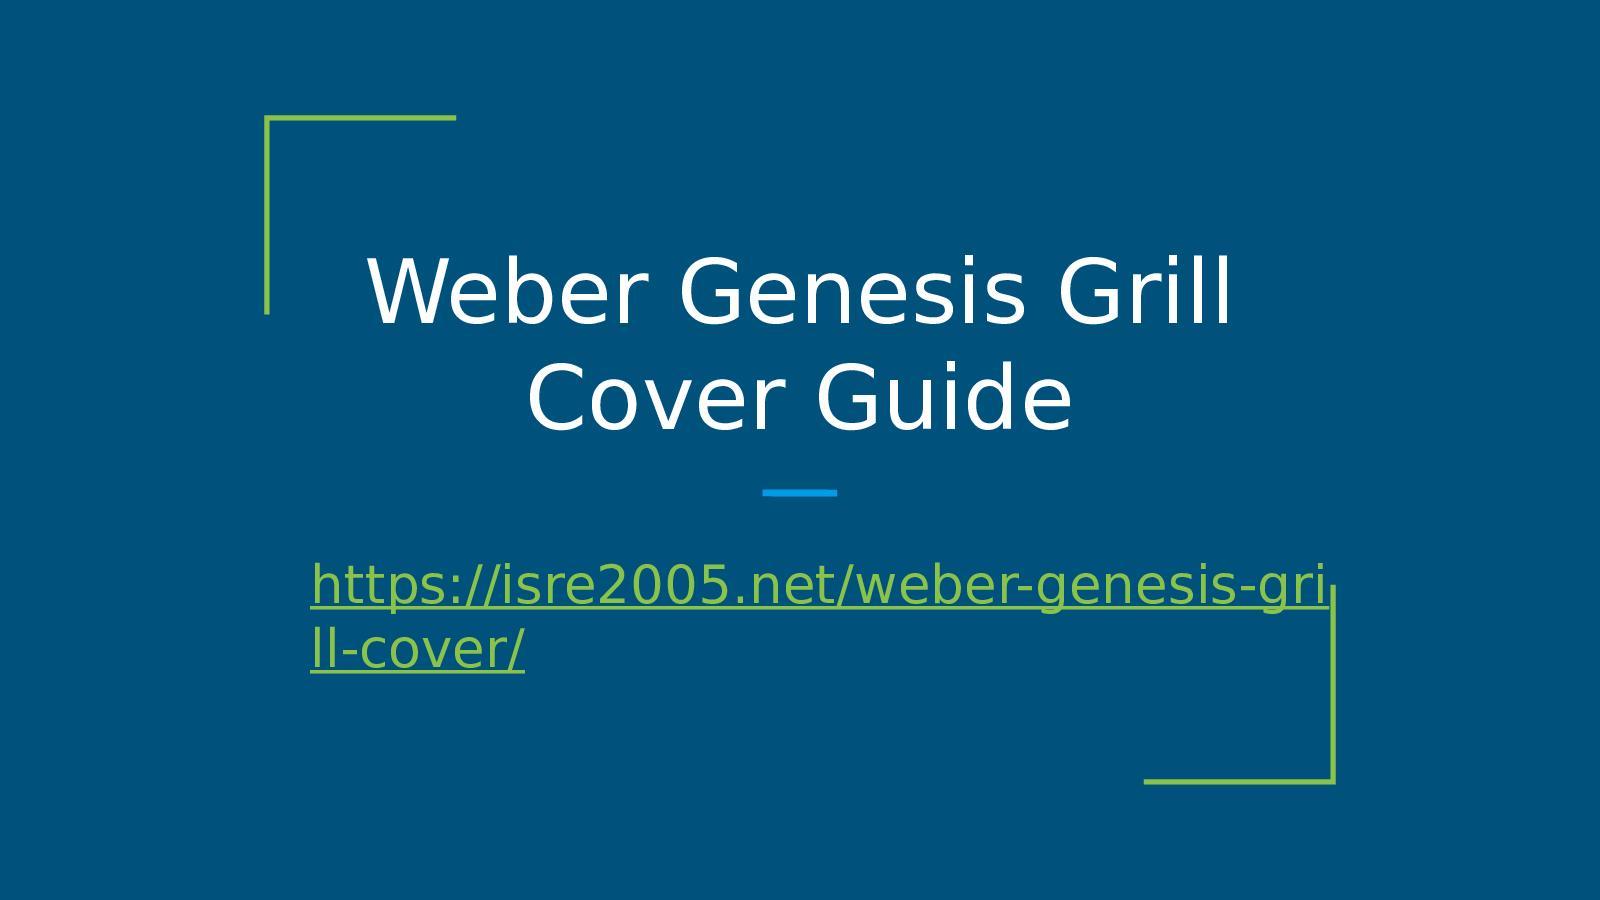 Weber Genesis Grill Cover Guide Presentation